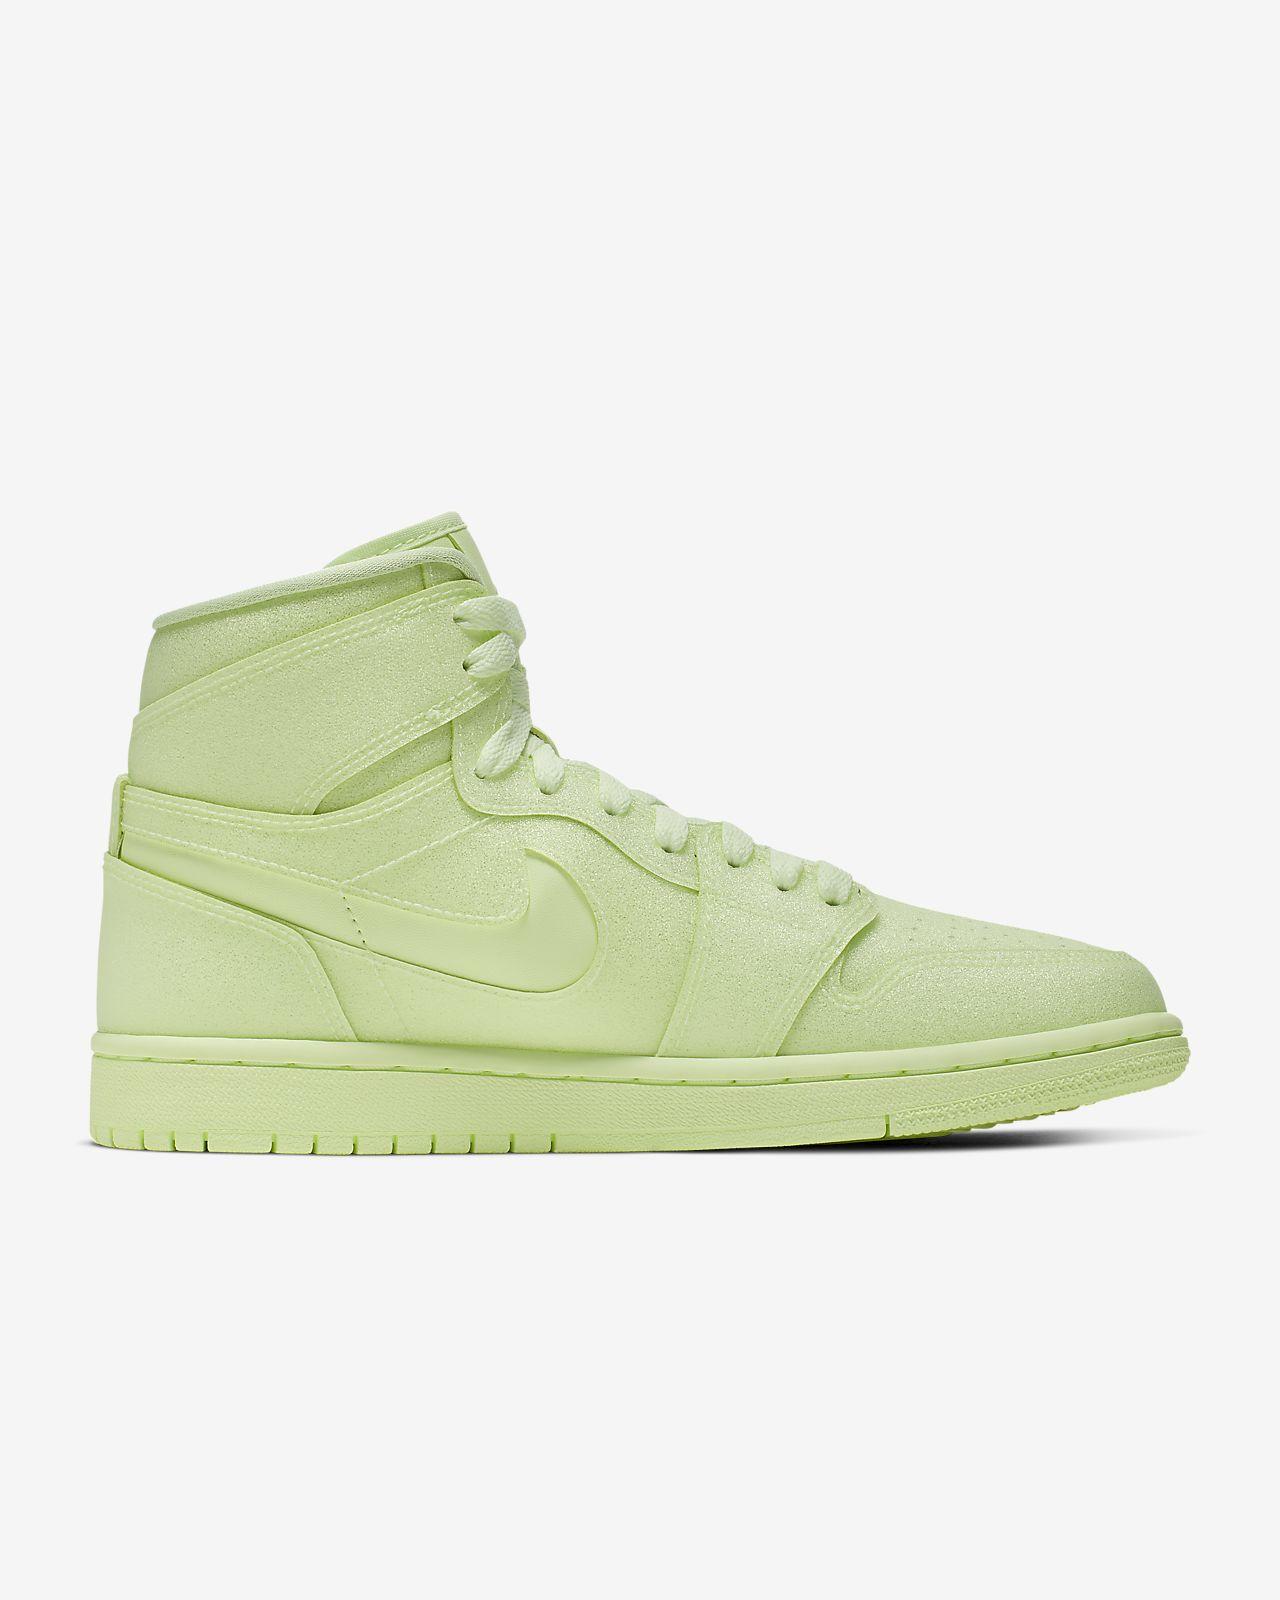 on sale b5bdd c9d84 ... Air Jordan 1 Retro High Premium Women s Shoe